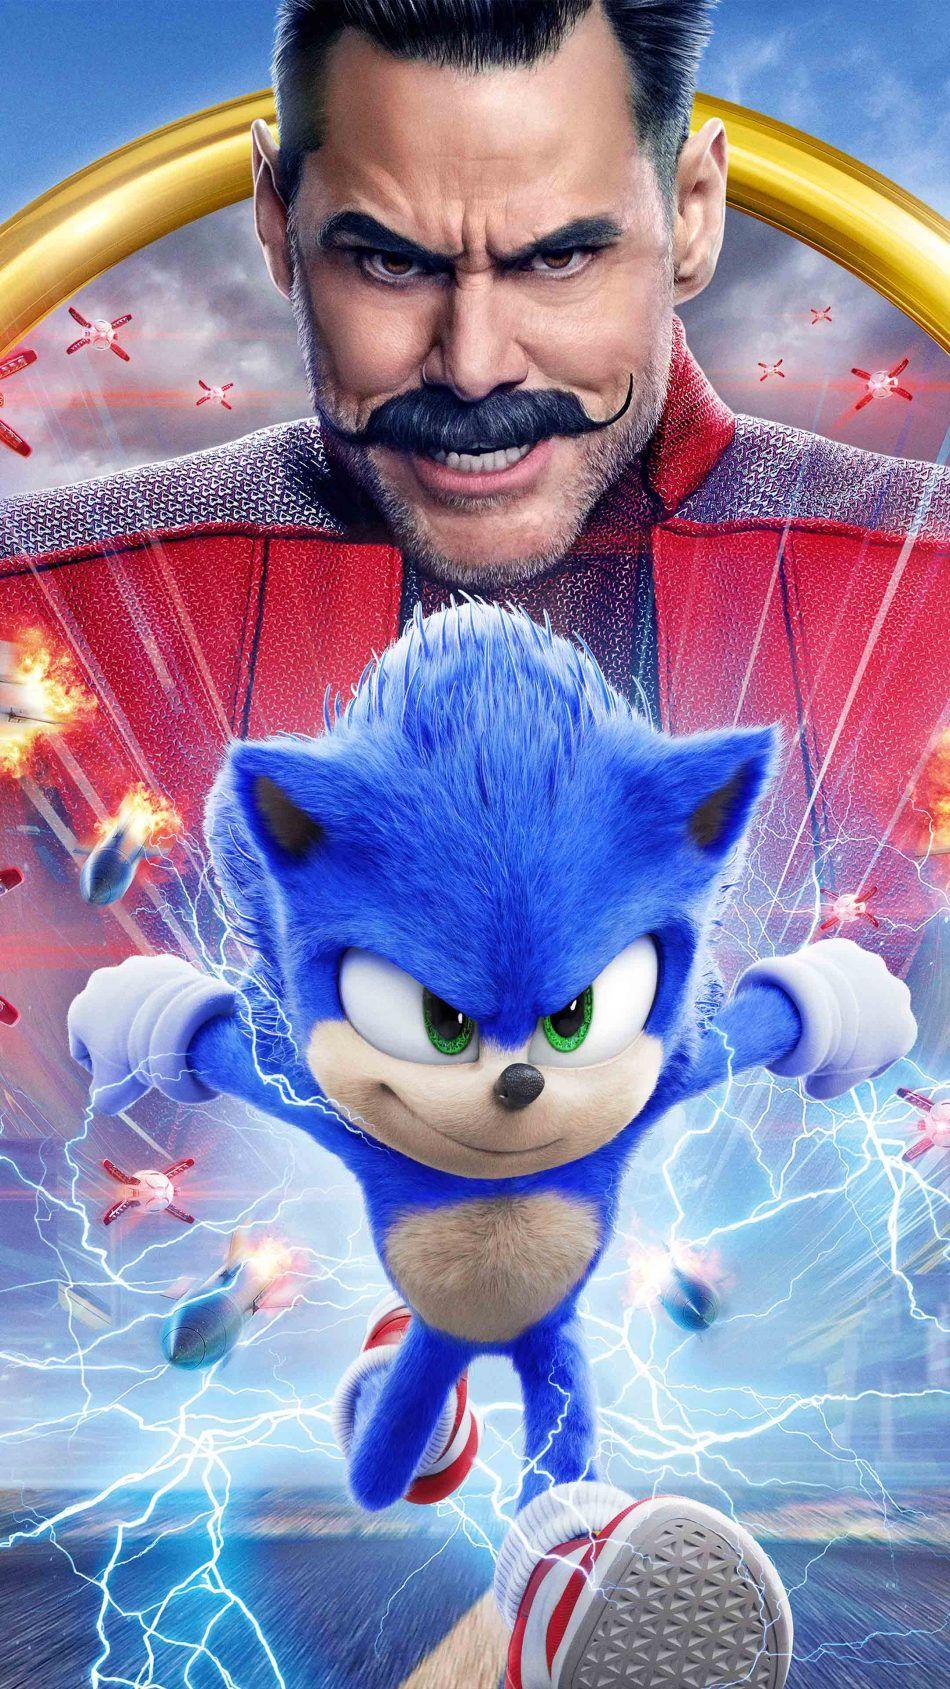 Sonic The Hedgehog 2020 Sonic the hedgehog, Hedgehog